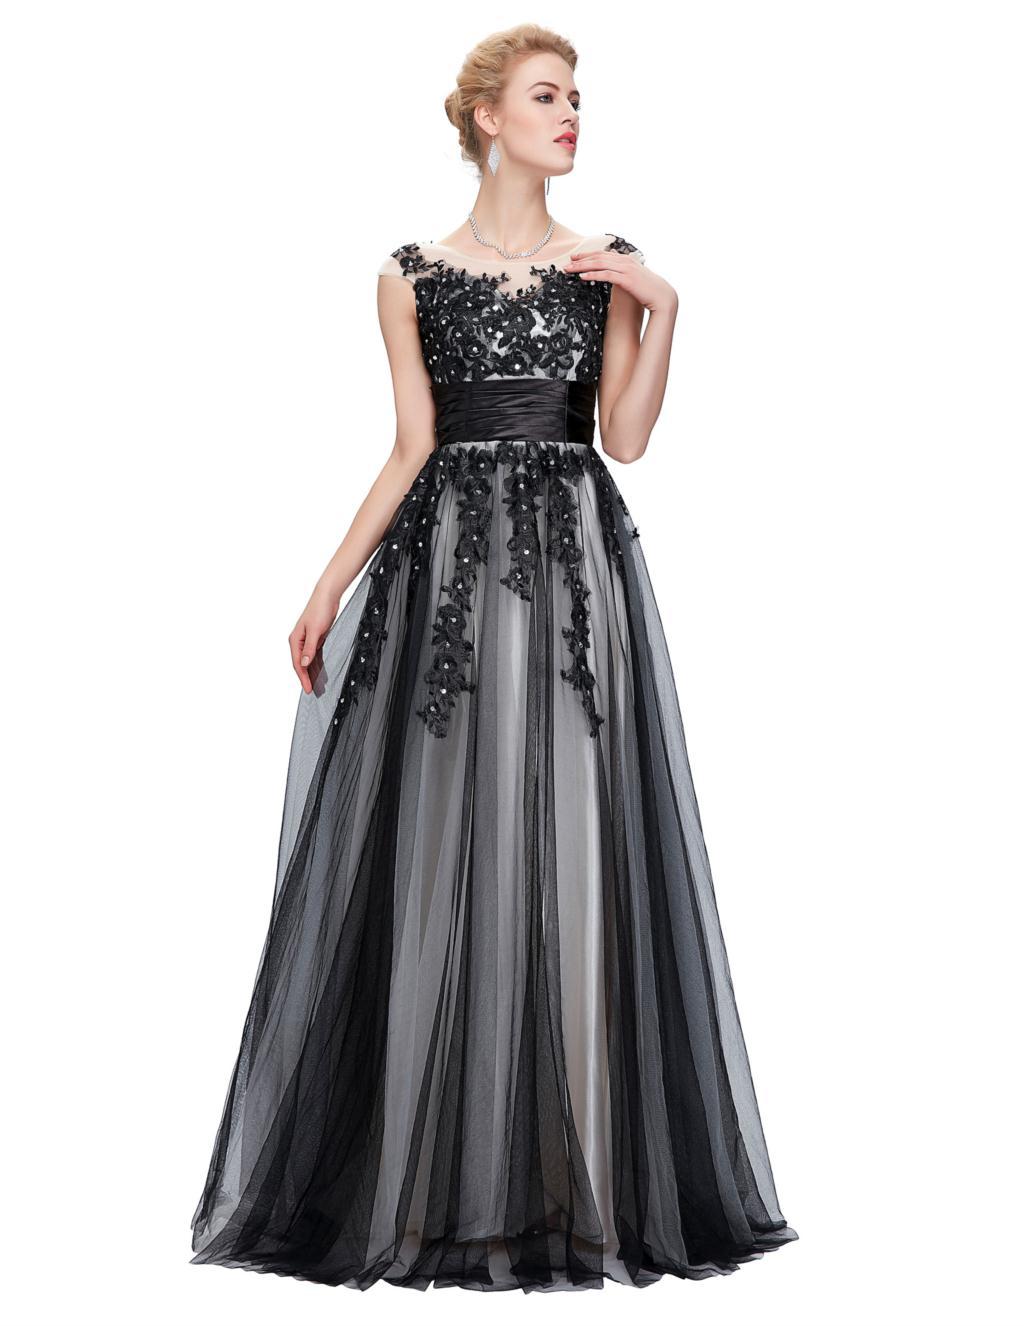 Elegant Lace Appliques Mother of the Bride Dress 4